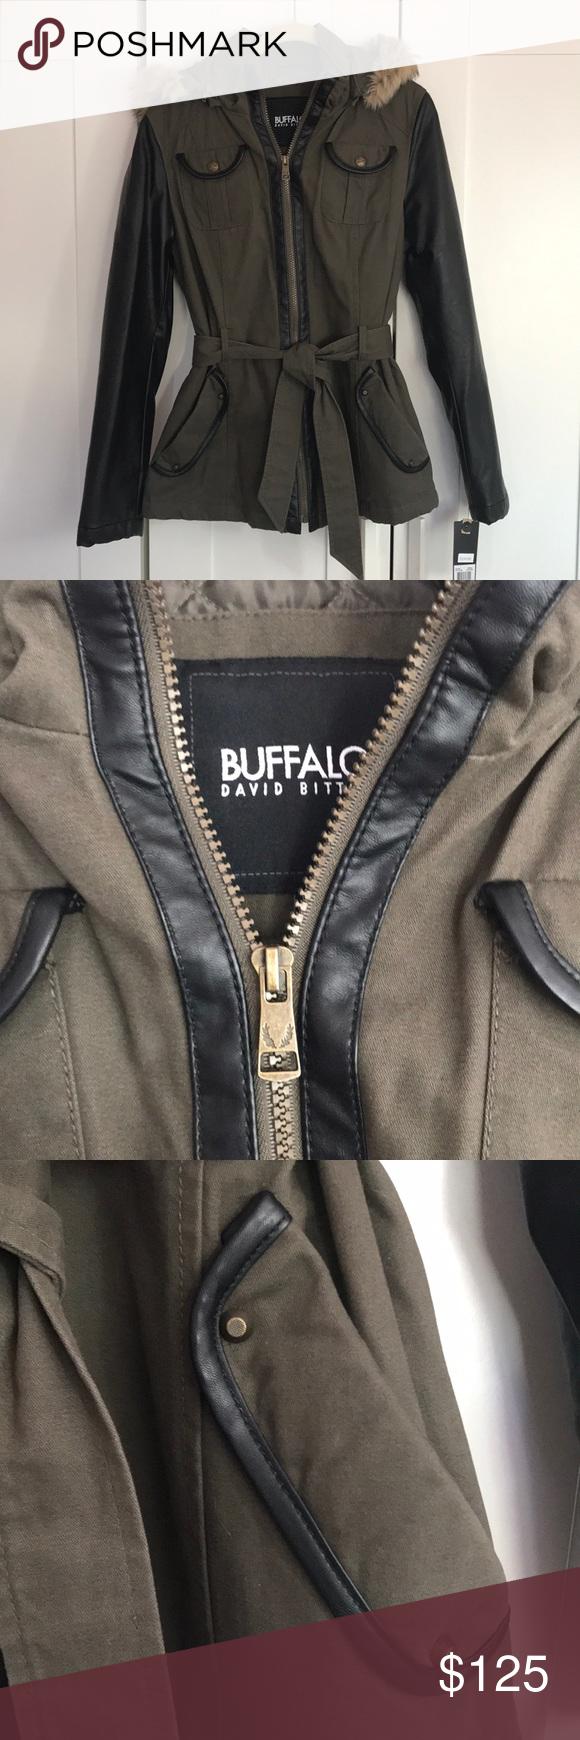 Nwt Buffalo David Bitton Parka Jacket Clothes Design Fashion Fashion Design [ 1740 x 580 Pixel ]